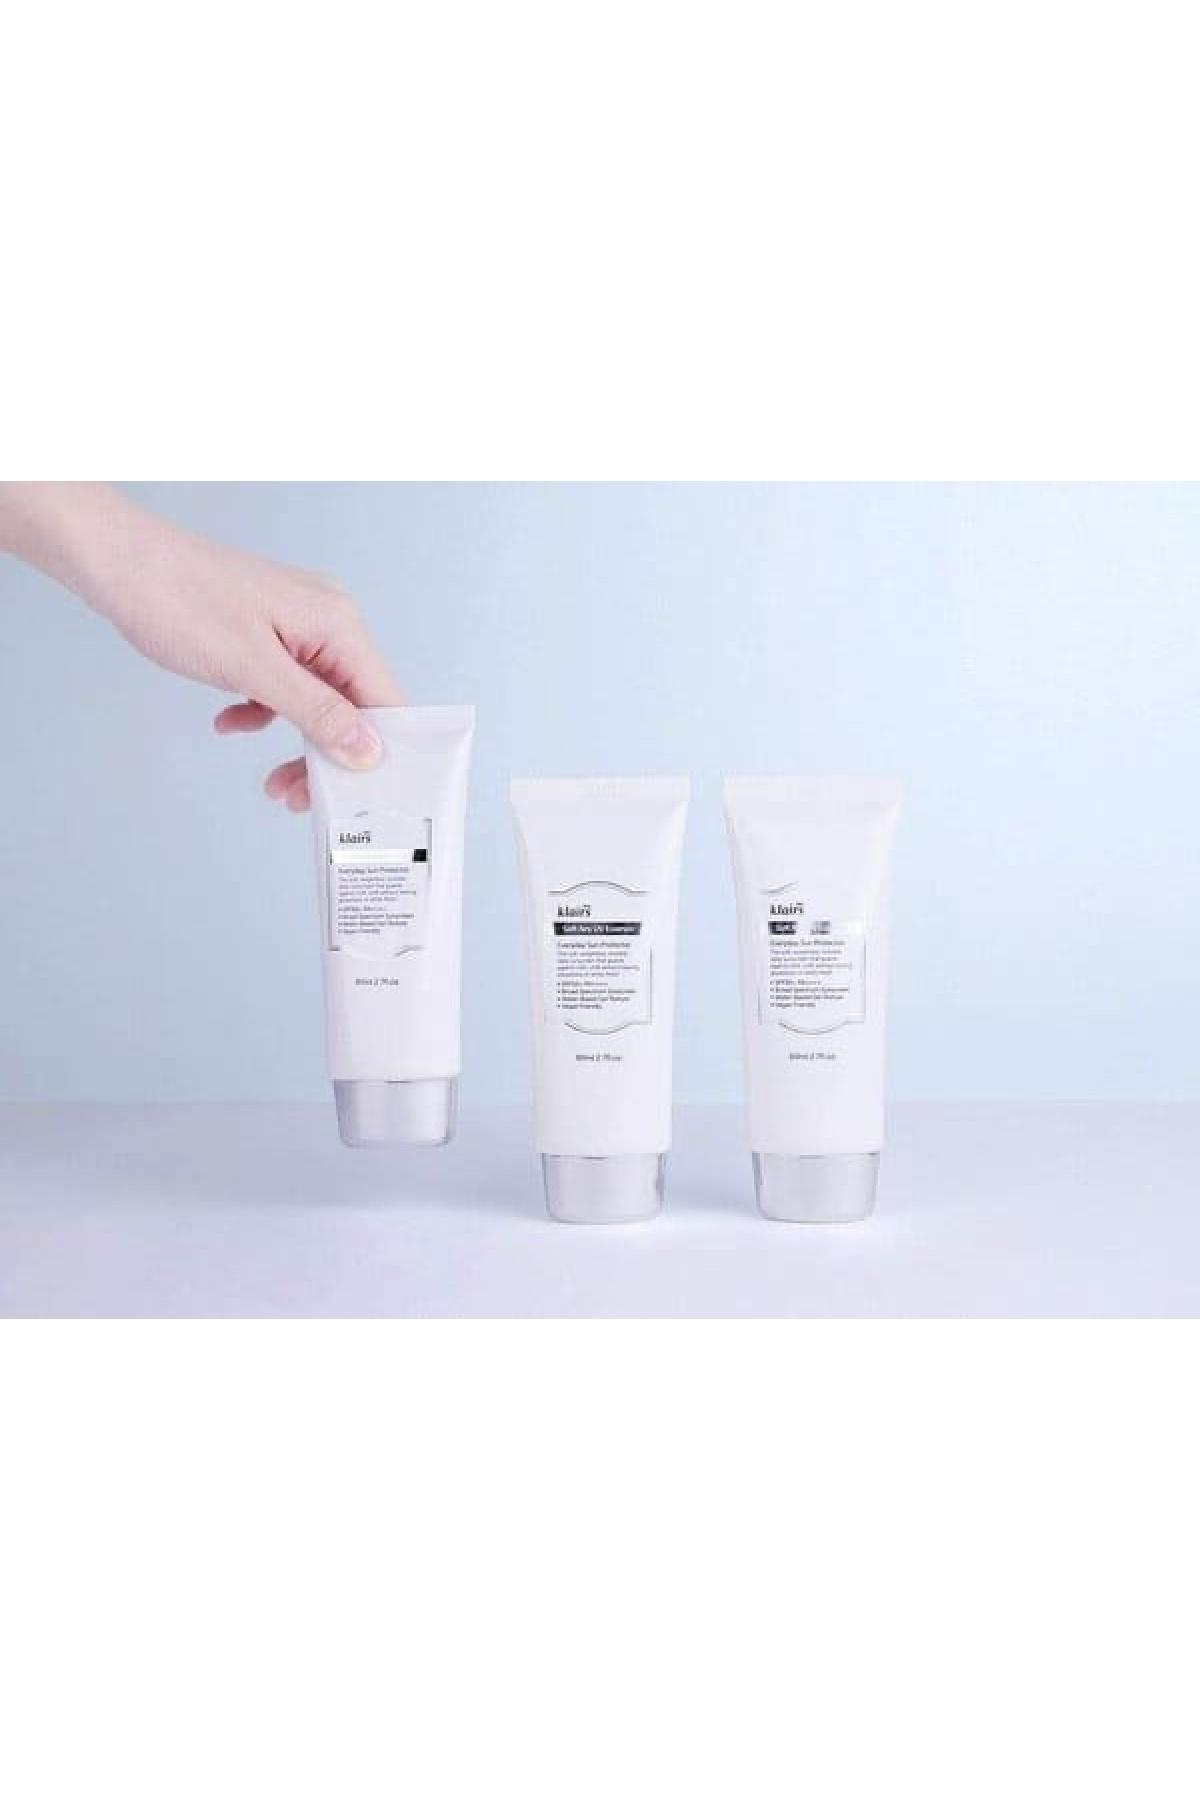 Солнцезащитный крем с спф 50 KLAIRS Soft Airy UV Essence 80ml, DEAR, KLAIRS